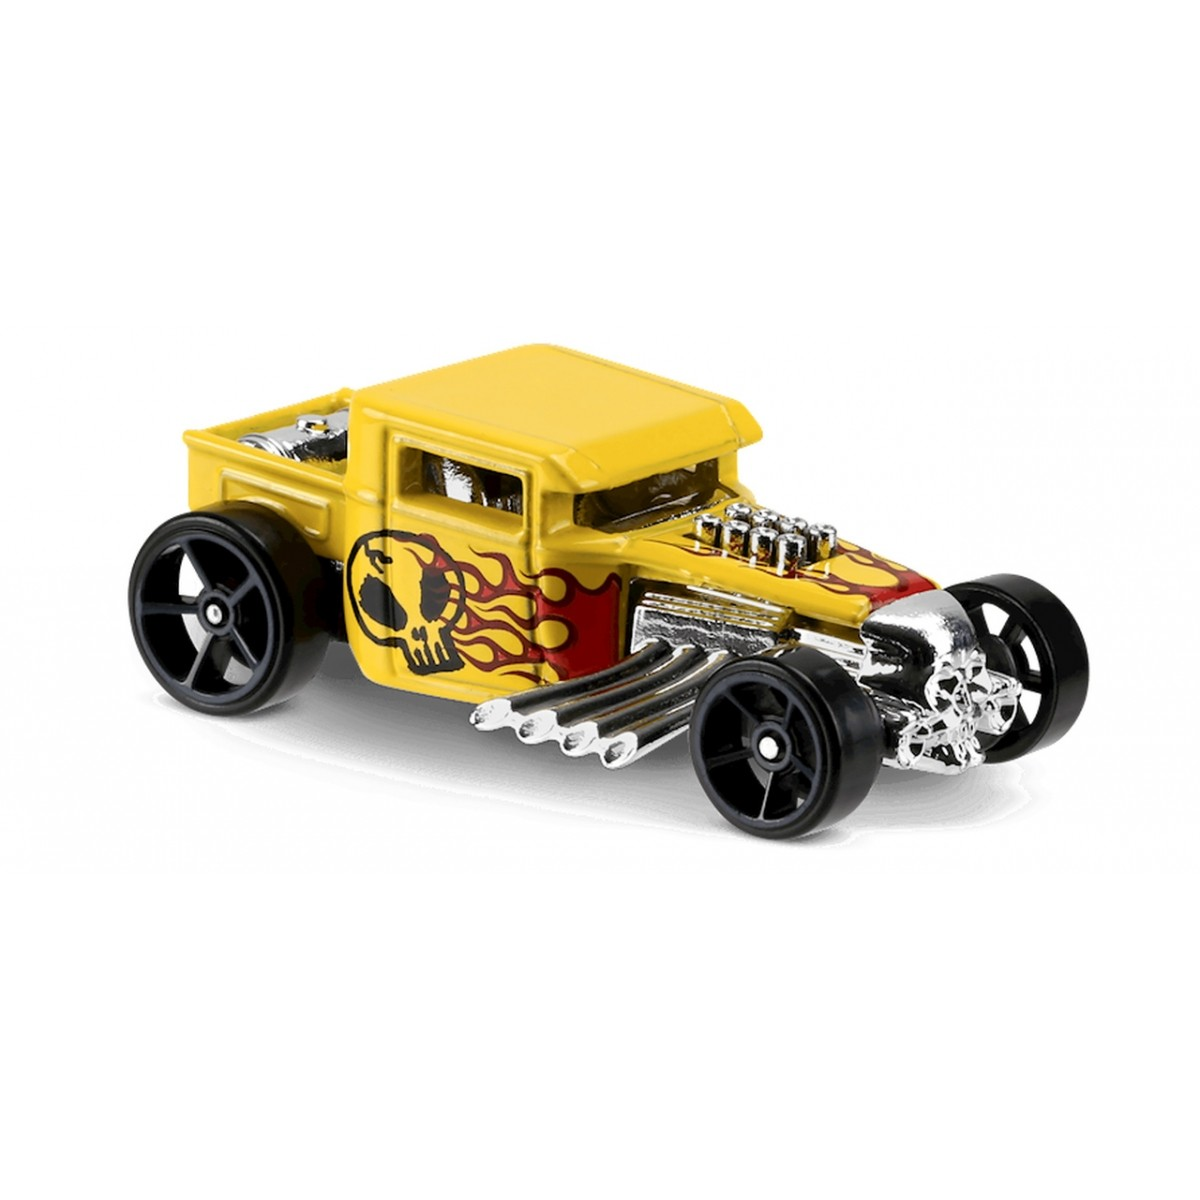 Carrinho Hot Wheels: Bone Shaker Amarelo